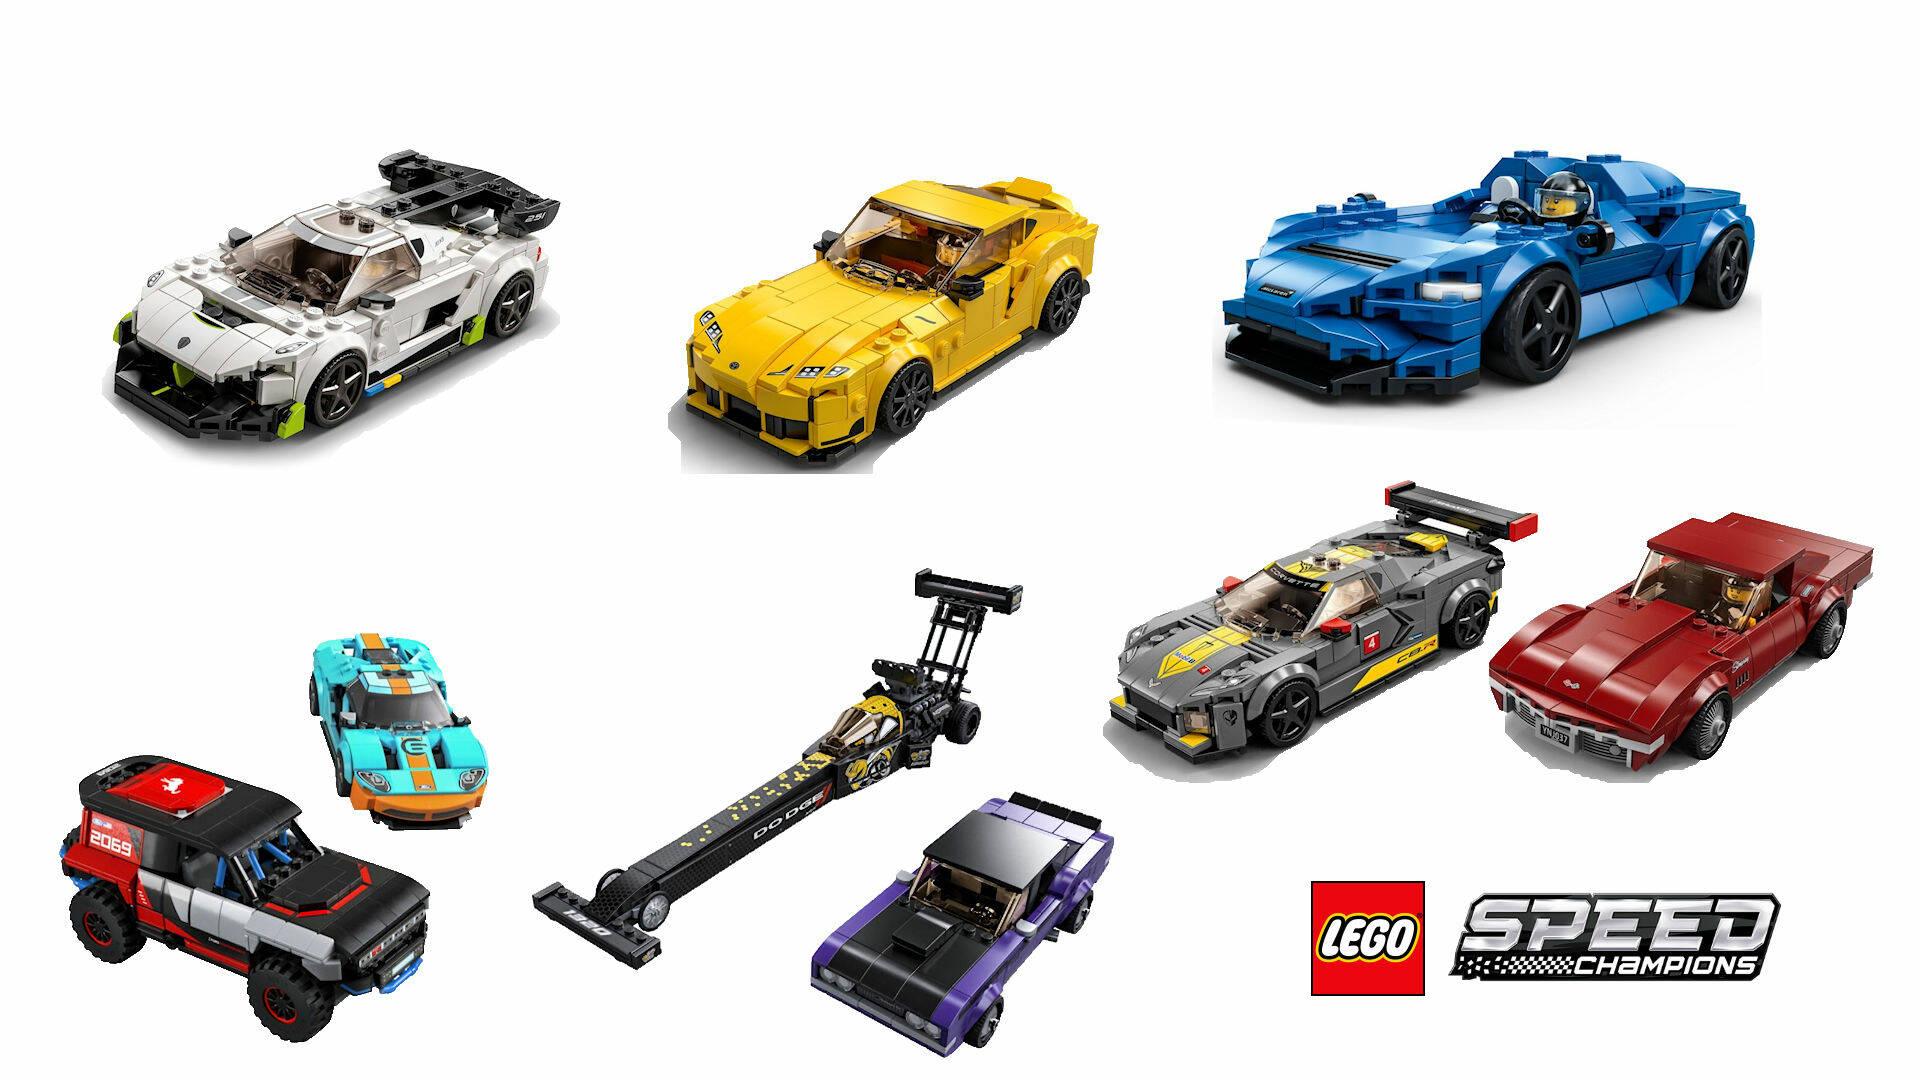 LEGO SPEED CHAMPIONS SUMMER 2021